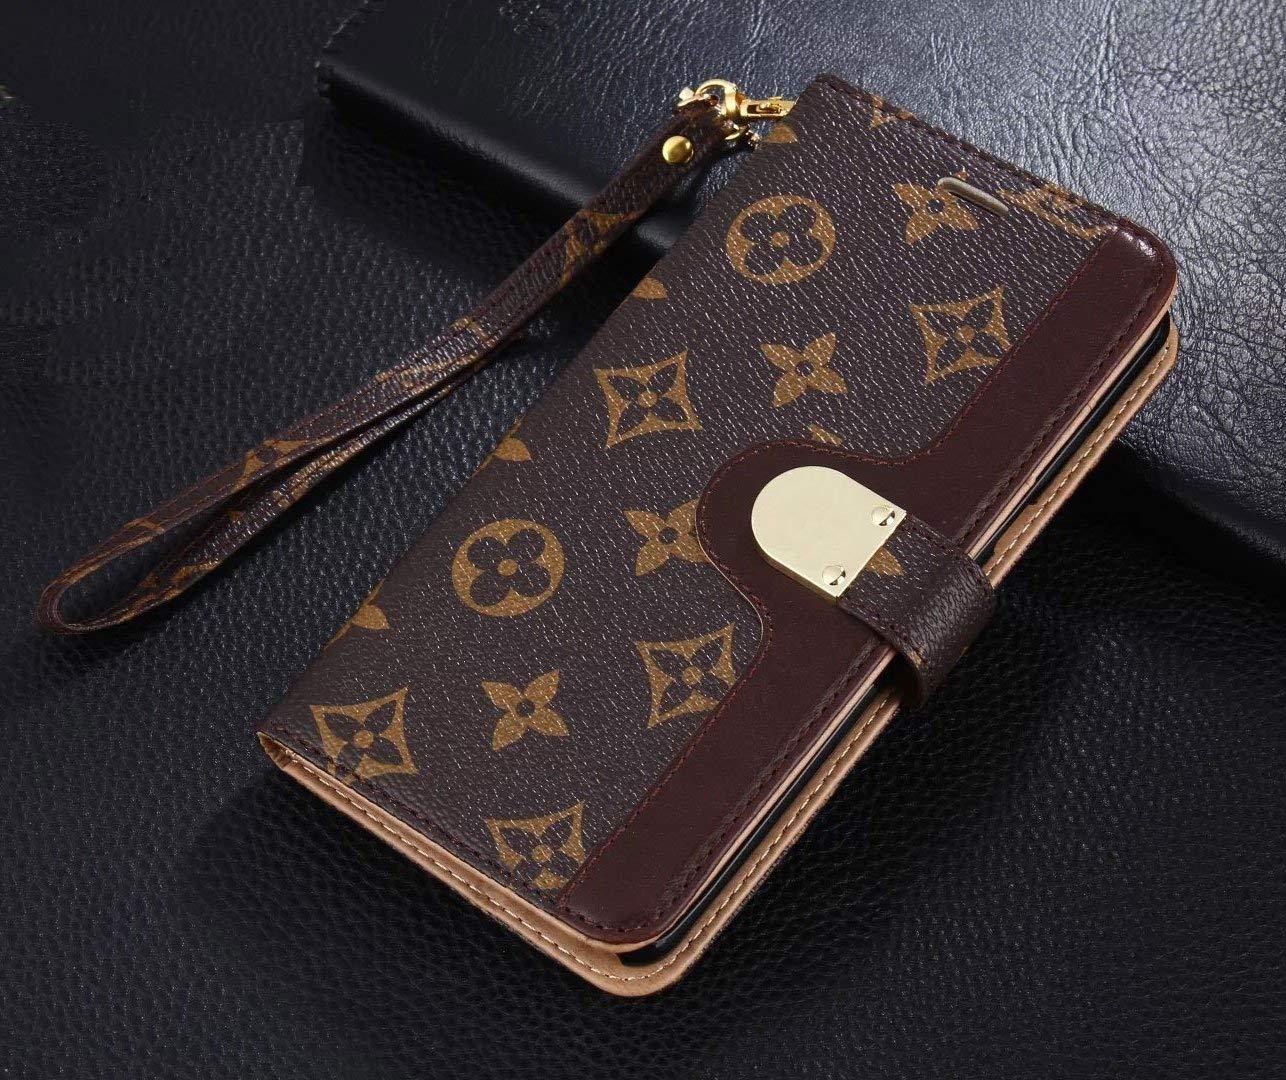 Luxury Elegant Bifold Magnetic Leather Clip Pocket Women Men Girls Boys Flip Wallet case for Apple iPhone 7 Plus and iPhone 8 Plus (Big Floral Monogram) (Brown1) by Chenglnn